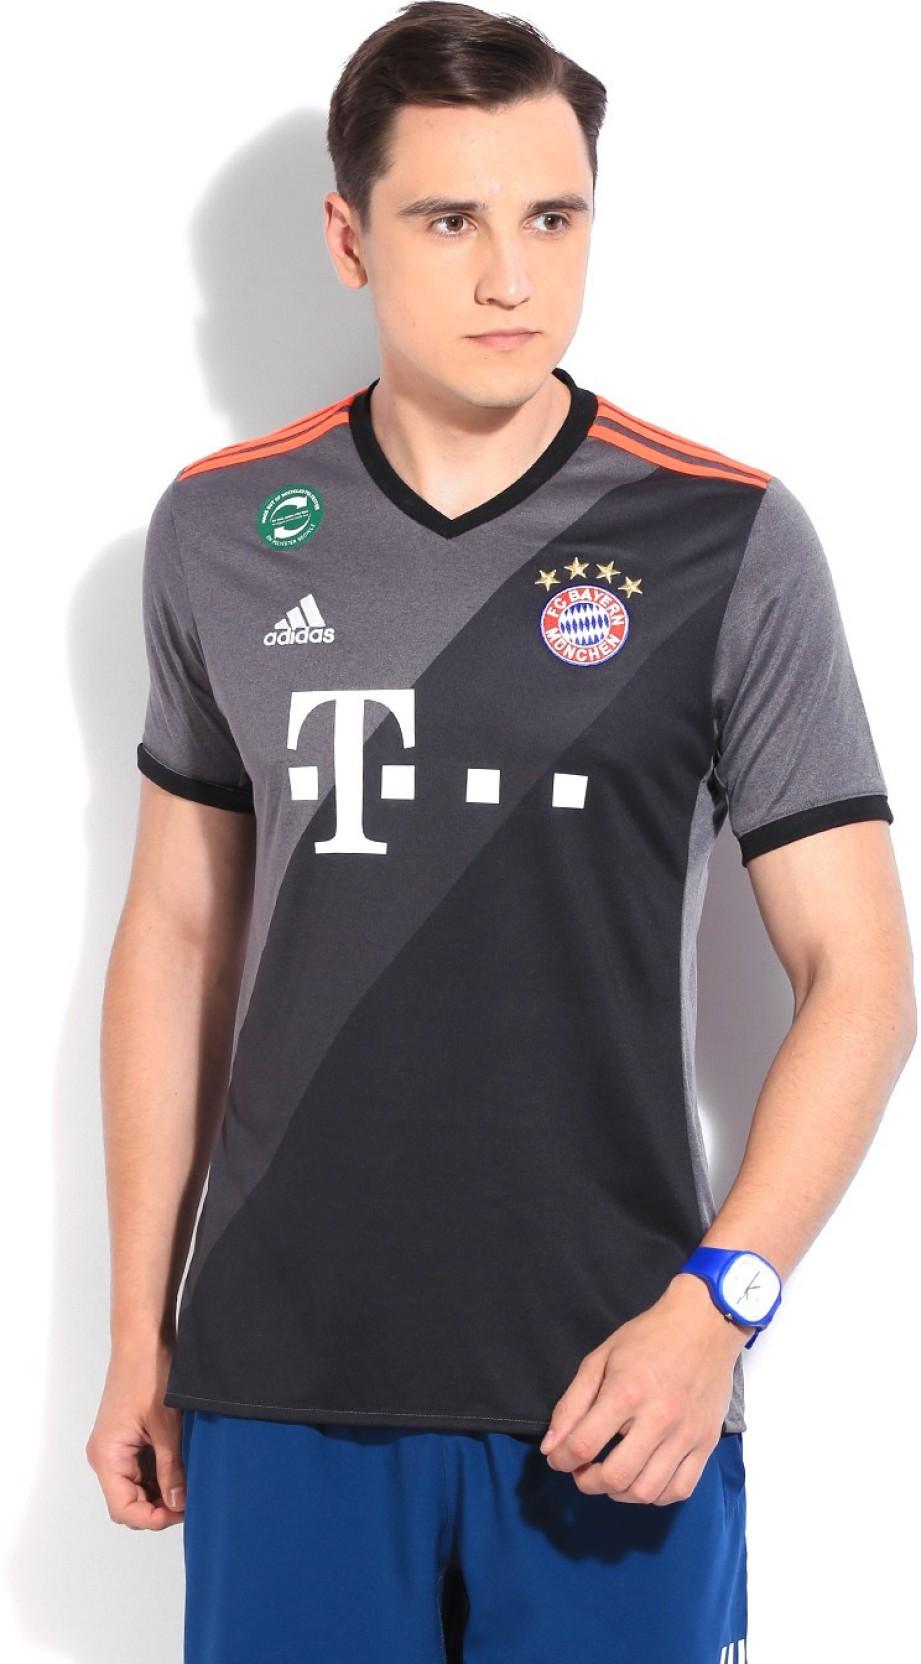 official photos d5009 b94c5 ADIDAS Bayern Munich Printed Men's Round Neck Black, Grey T-Shirt